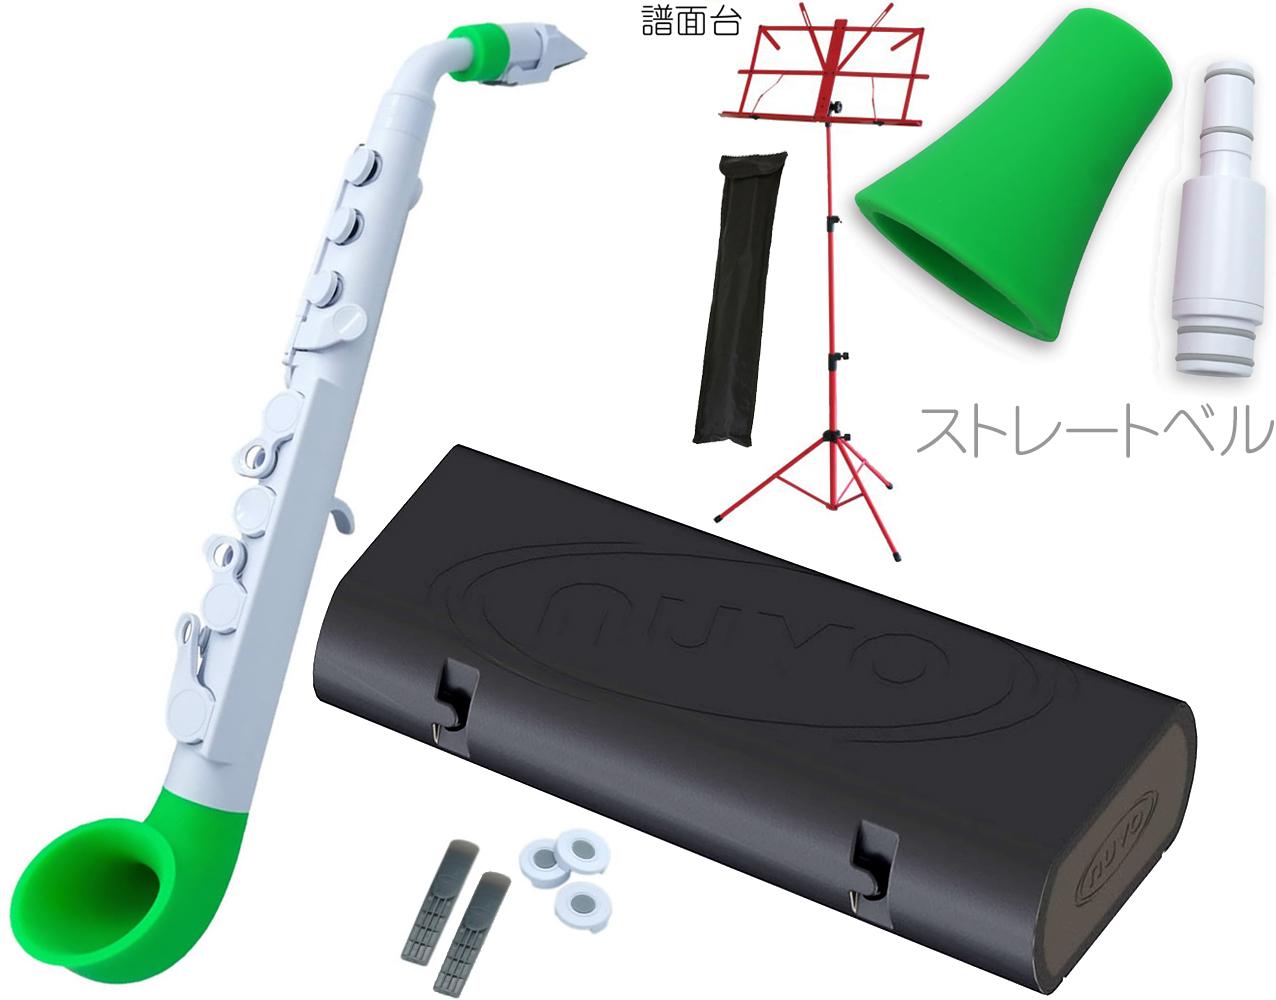 NUVO ( Green ヌーボ ) jSAX リード楽器 ホワイト グリーン N510JWGN サクソフォン プラスチック製 管楽器 サックス系 リード楽器 本体 サクソフォン 白色 緑色 Green【 jサックス WH/GN セット C】 送料無料, サンマリーノ:6fcfbbca --- officewill.xsrv.jp